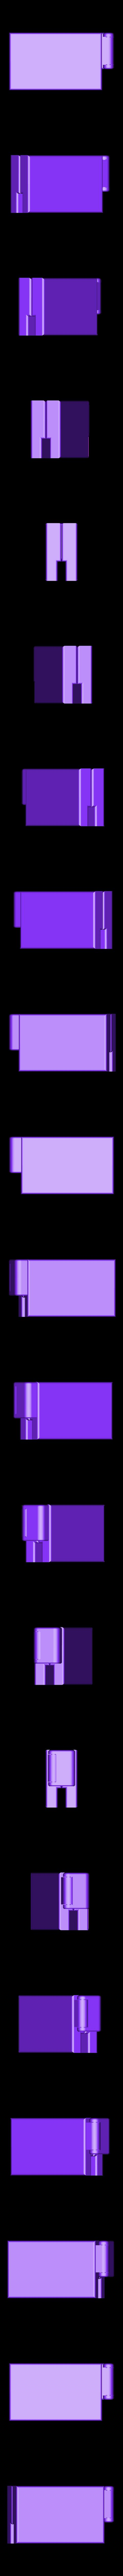 blankwallet.stl Download free STL file Video Game/Anime Themed Wallets • 3D print design, ChrisBobo